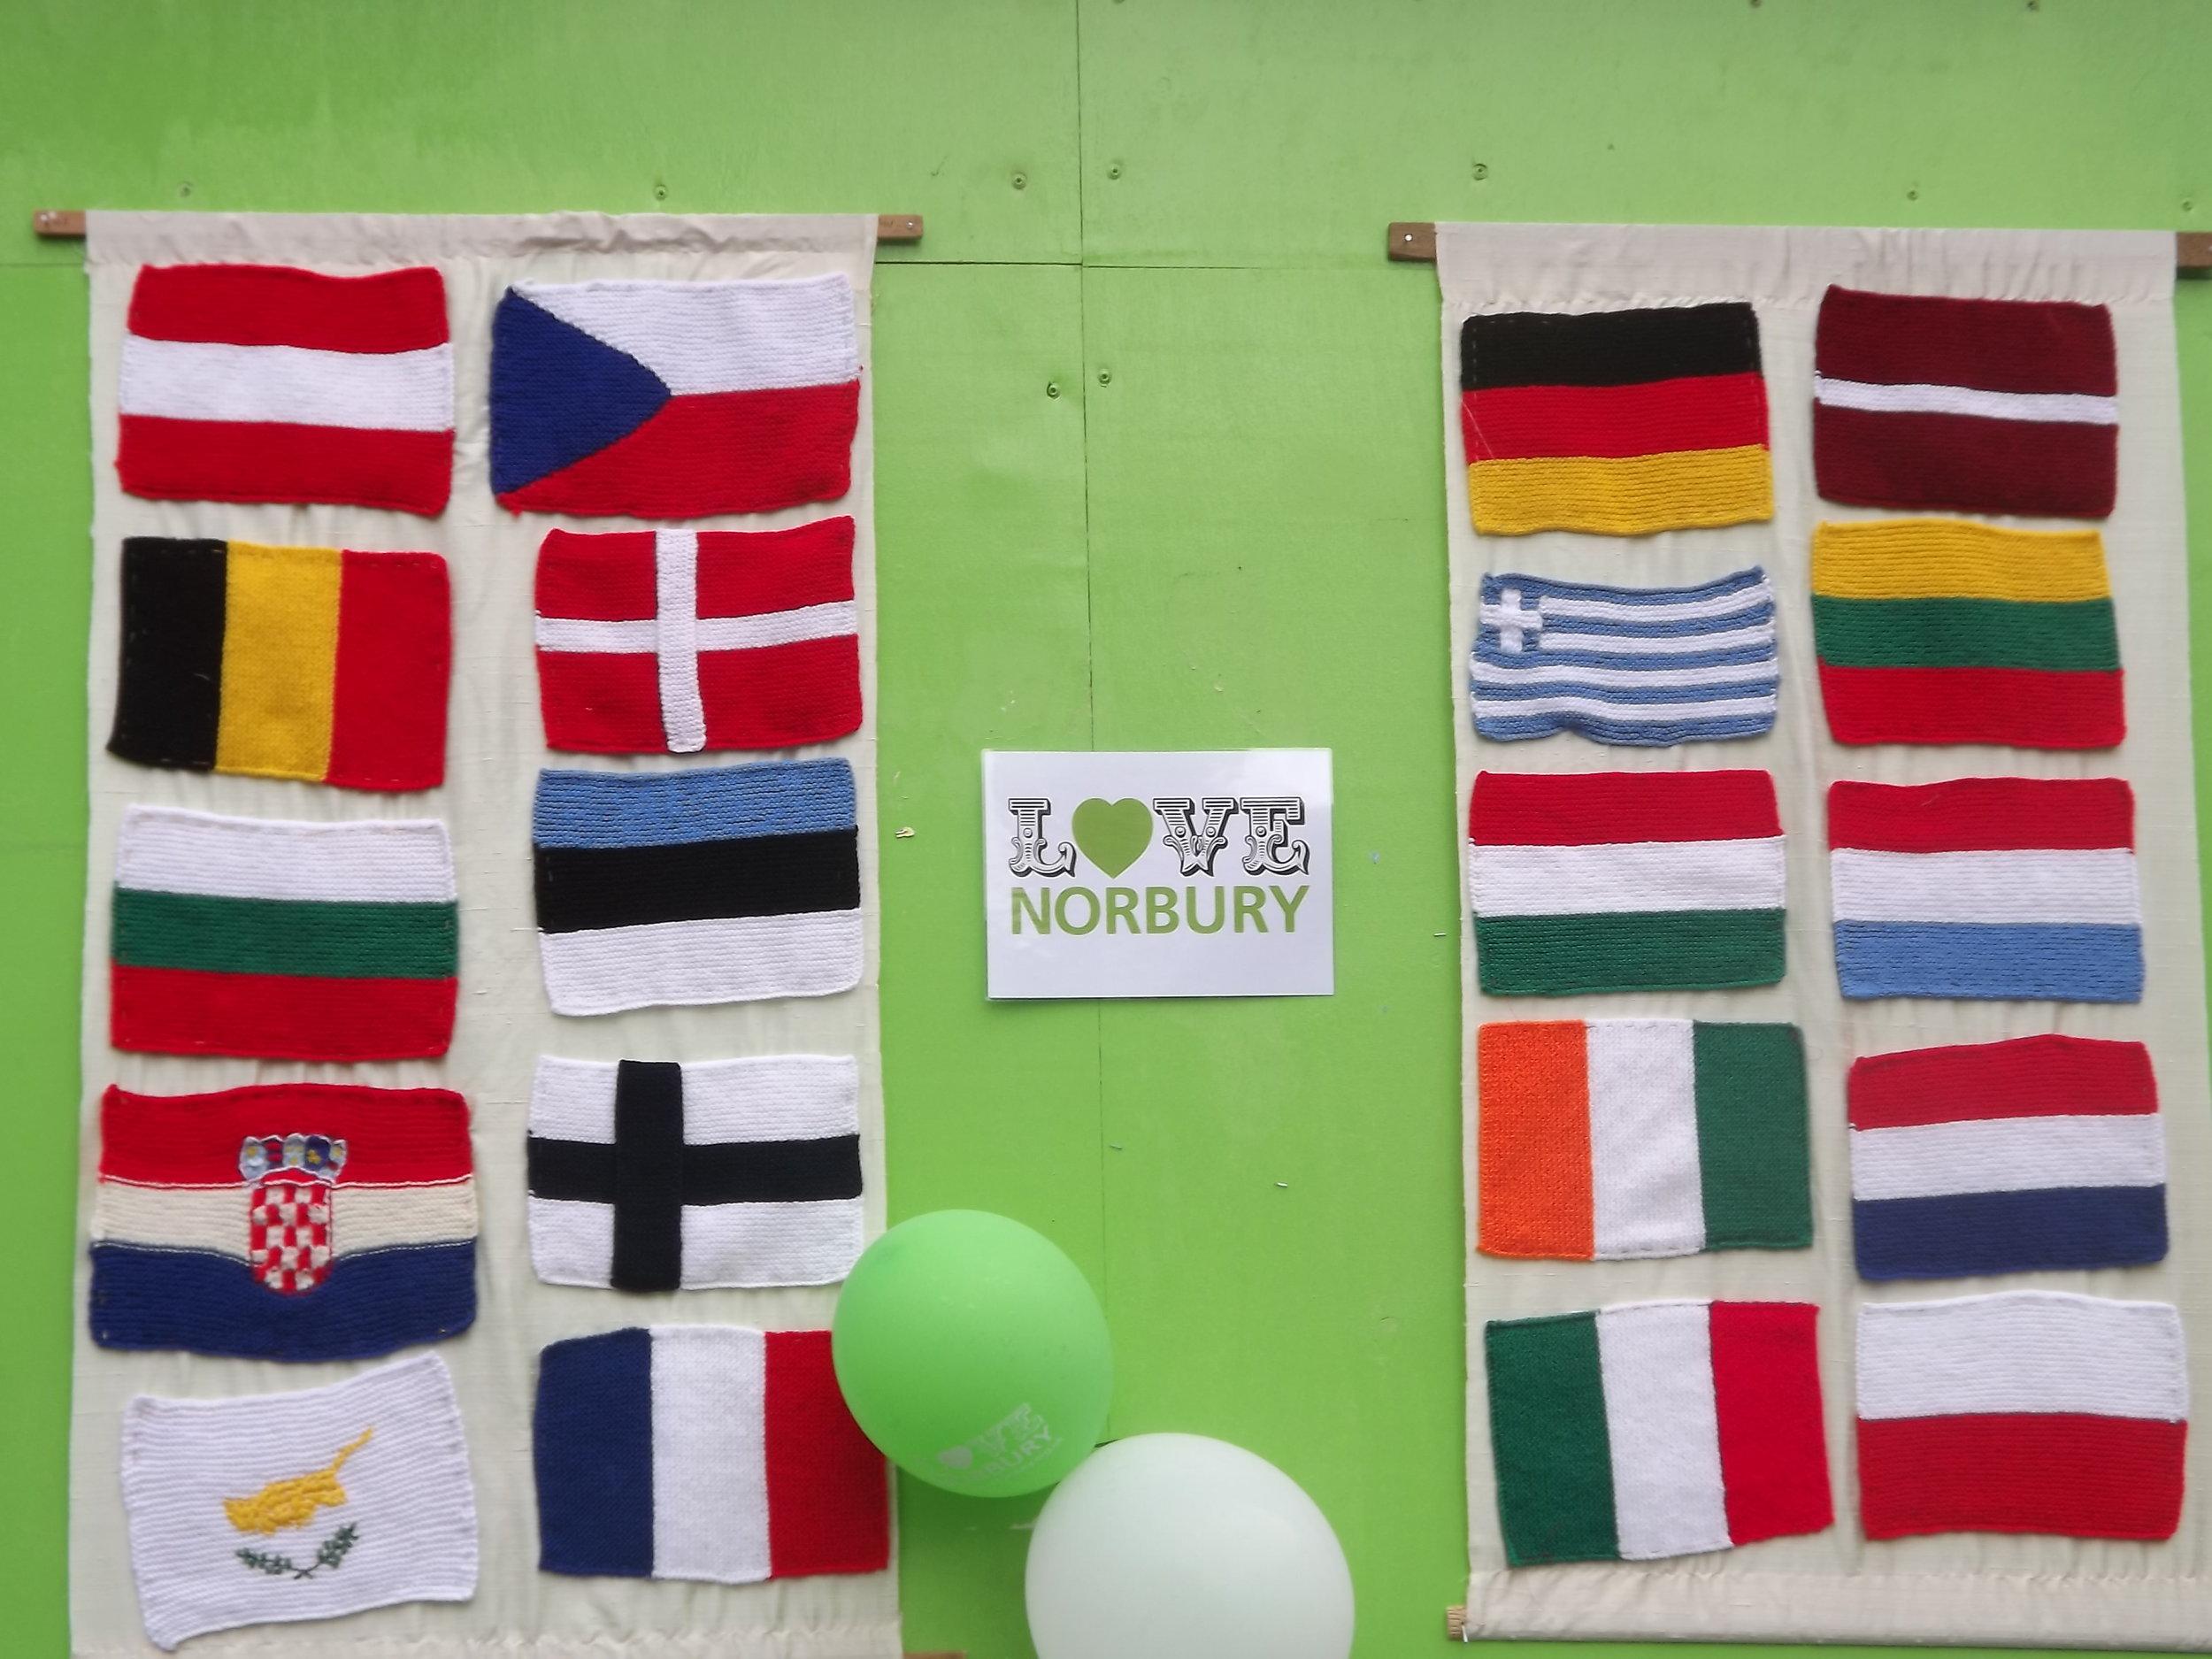 Knitting display at Love Norbury (3).JPG